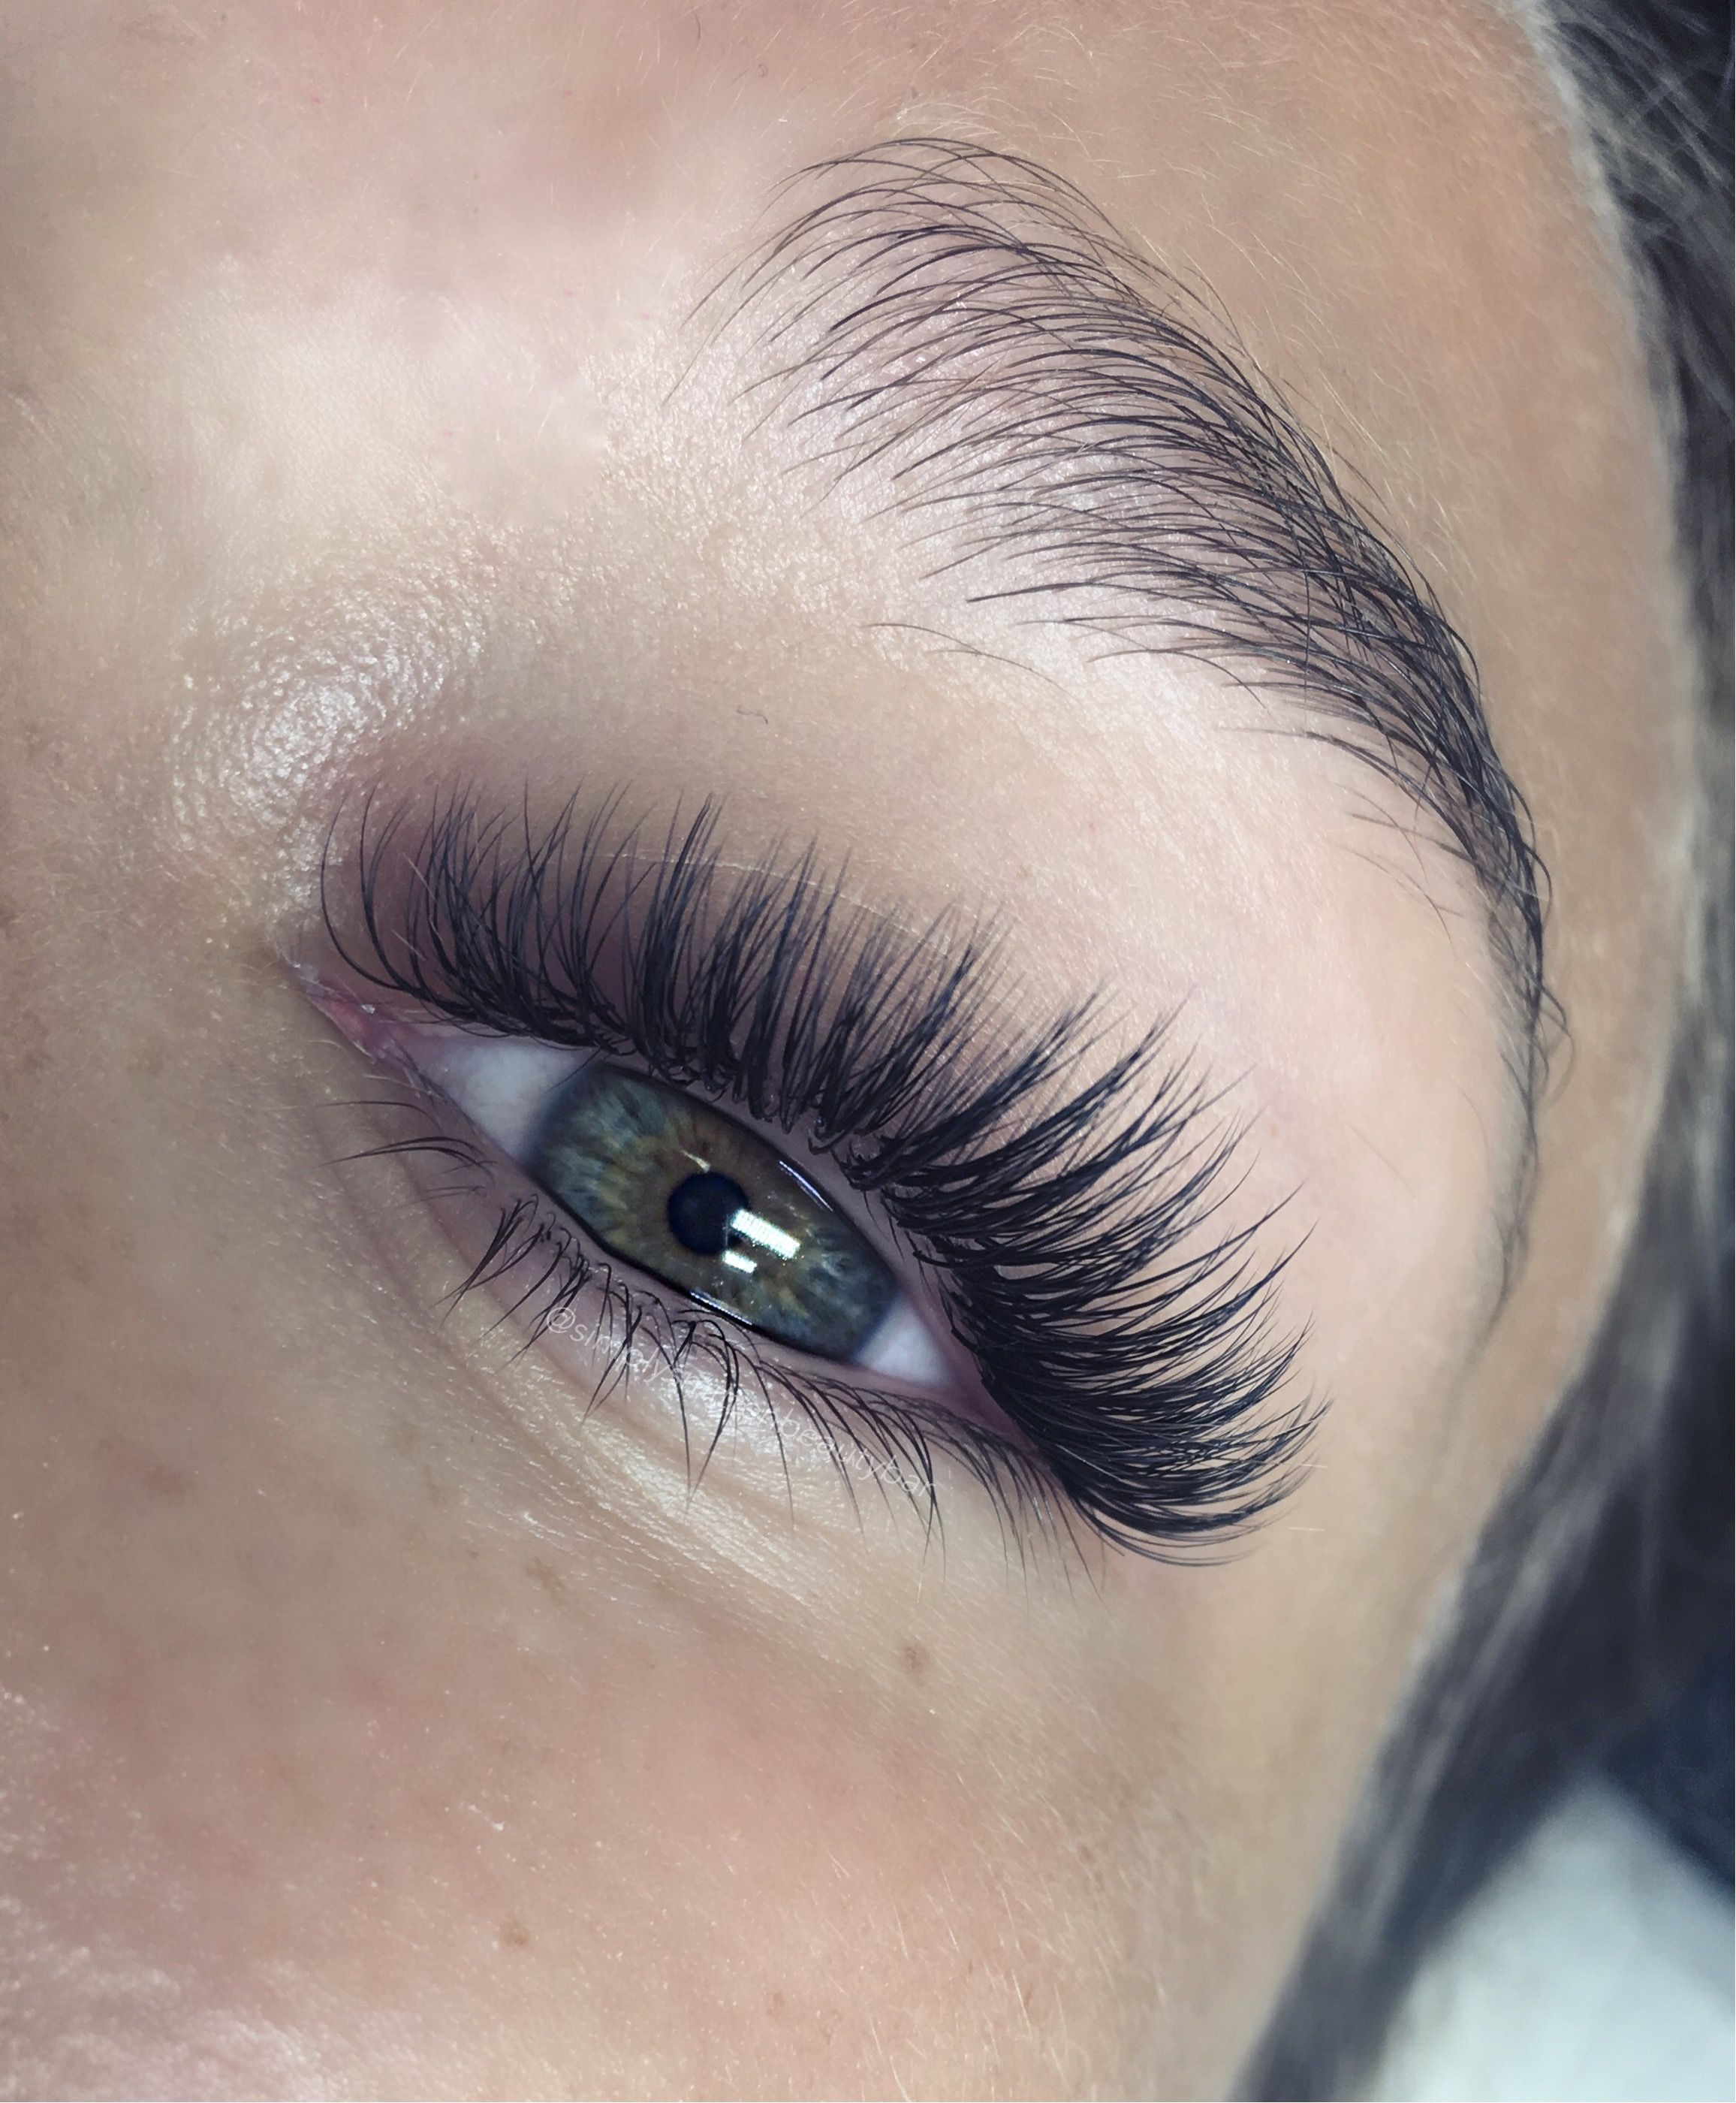 textured volume lashes by Simply Smitten Beauty Bar - Charleston, SC 29407 843-830-2264 #charlestonlashes #eyelashescharleston #charlestonsalon #eyelashextensions